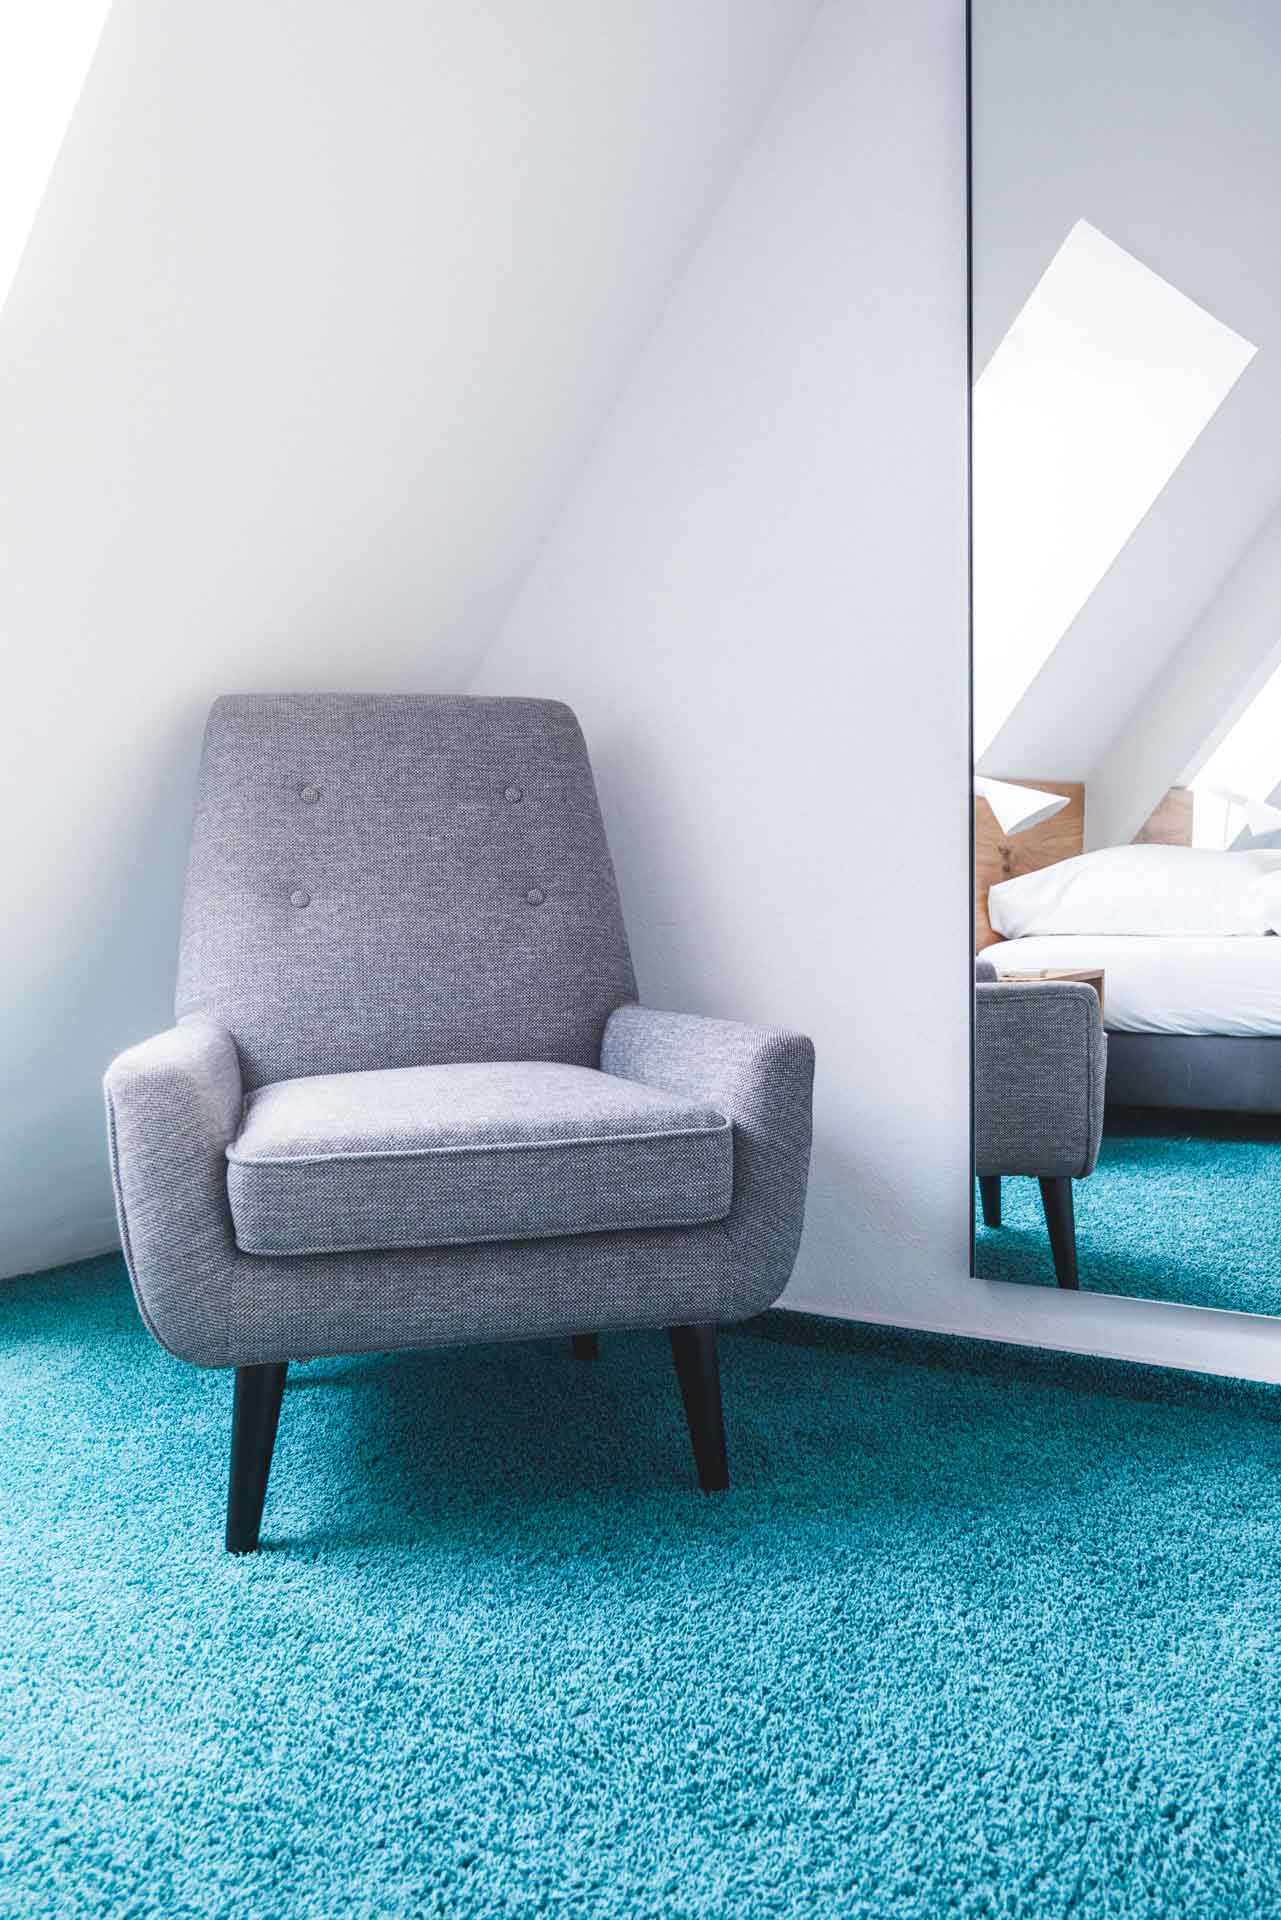 Ulmer Münster Hotel Room